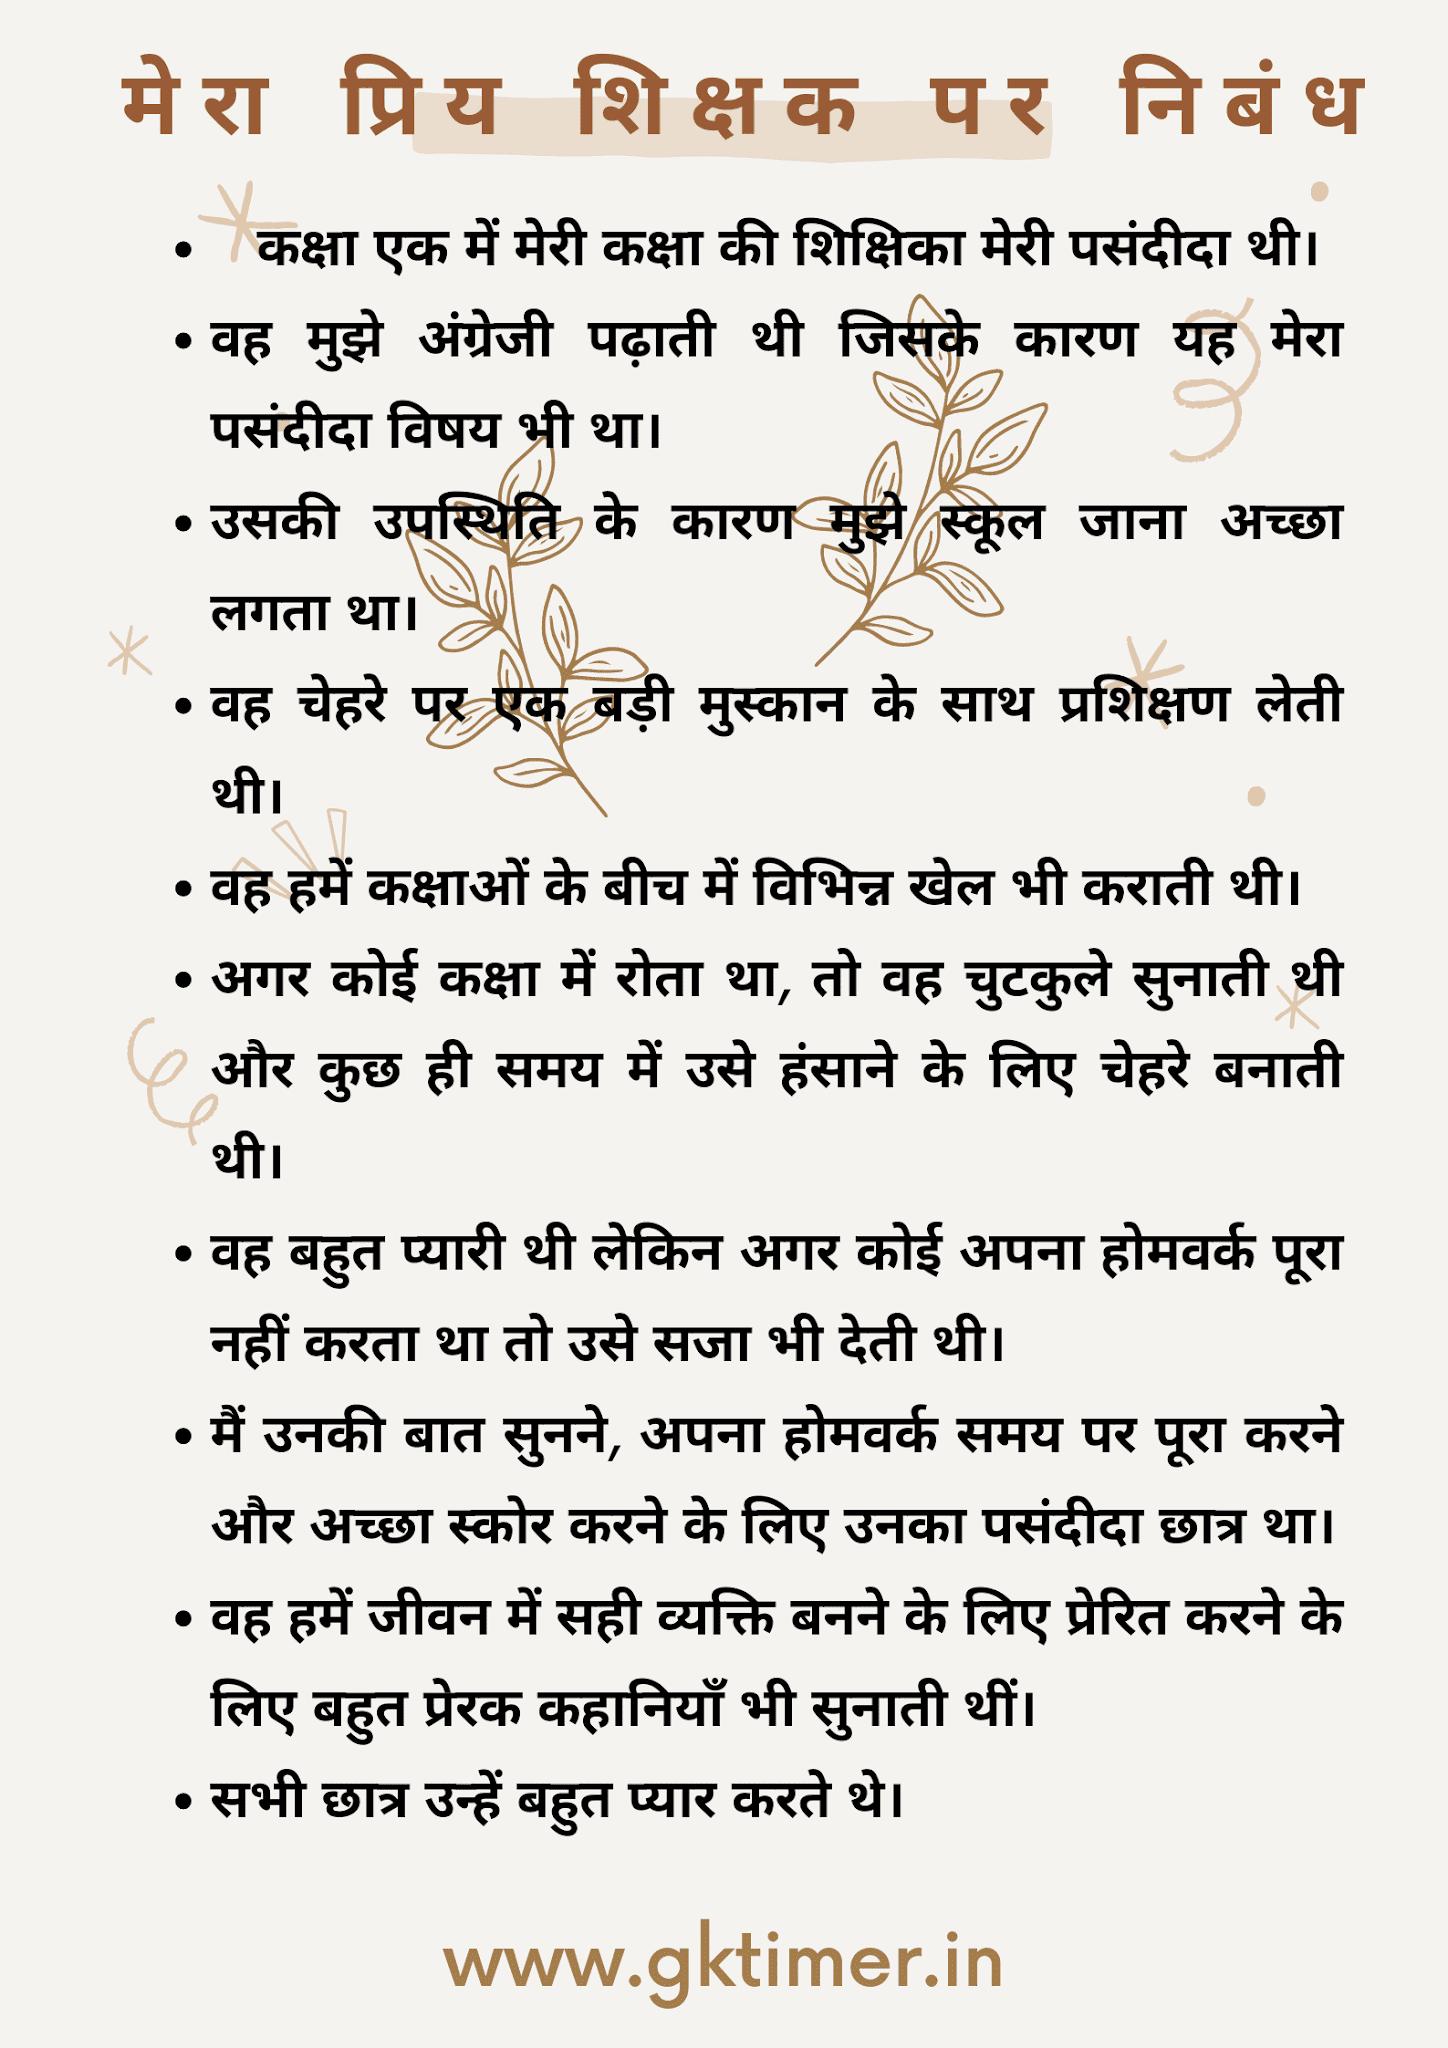 मेरा प्रिय अध्यापक पर निबंध | My Favourite Teacher Essay in Hindi | 10 Lines on My  Favourite Teacher in Hindi